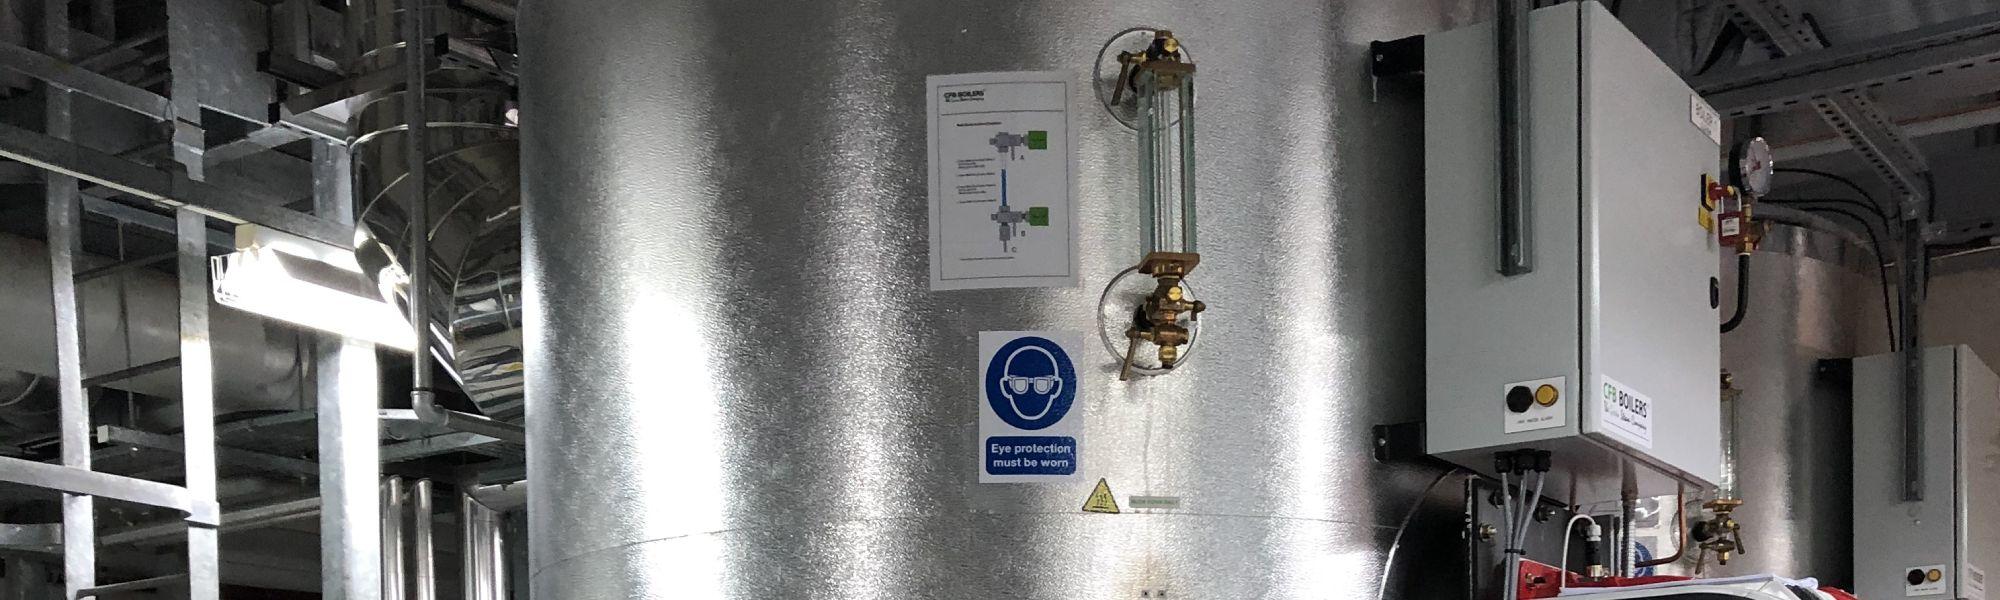 steam boiler fuels banner (1)